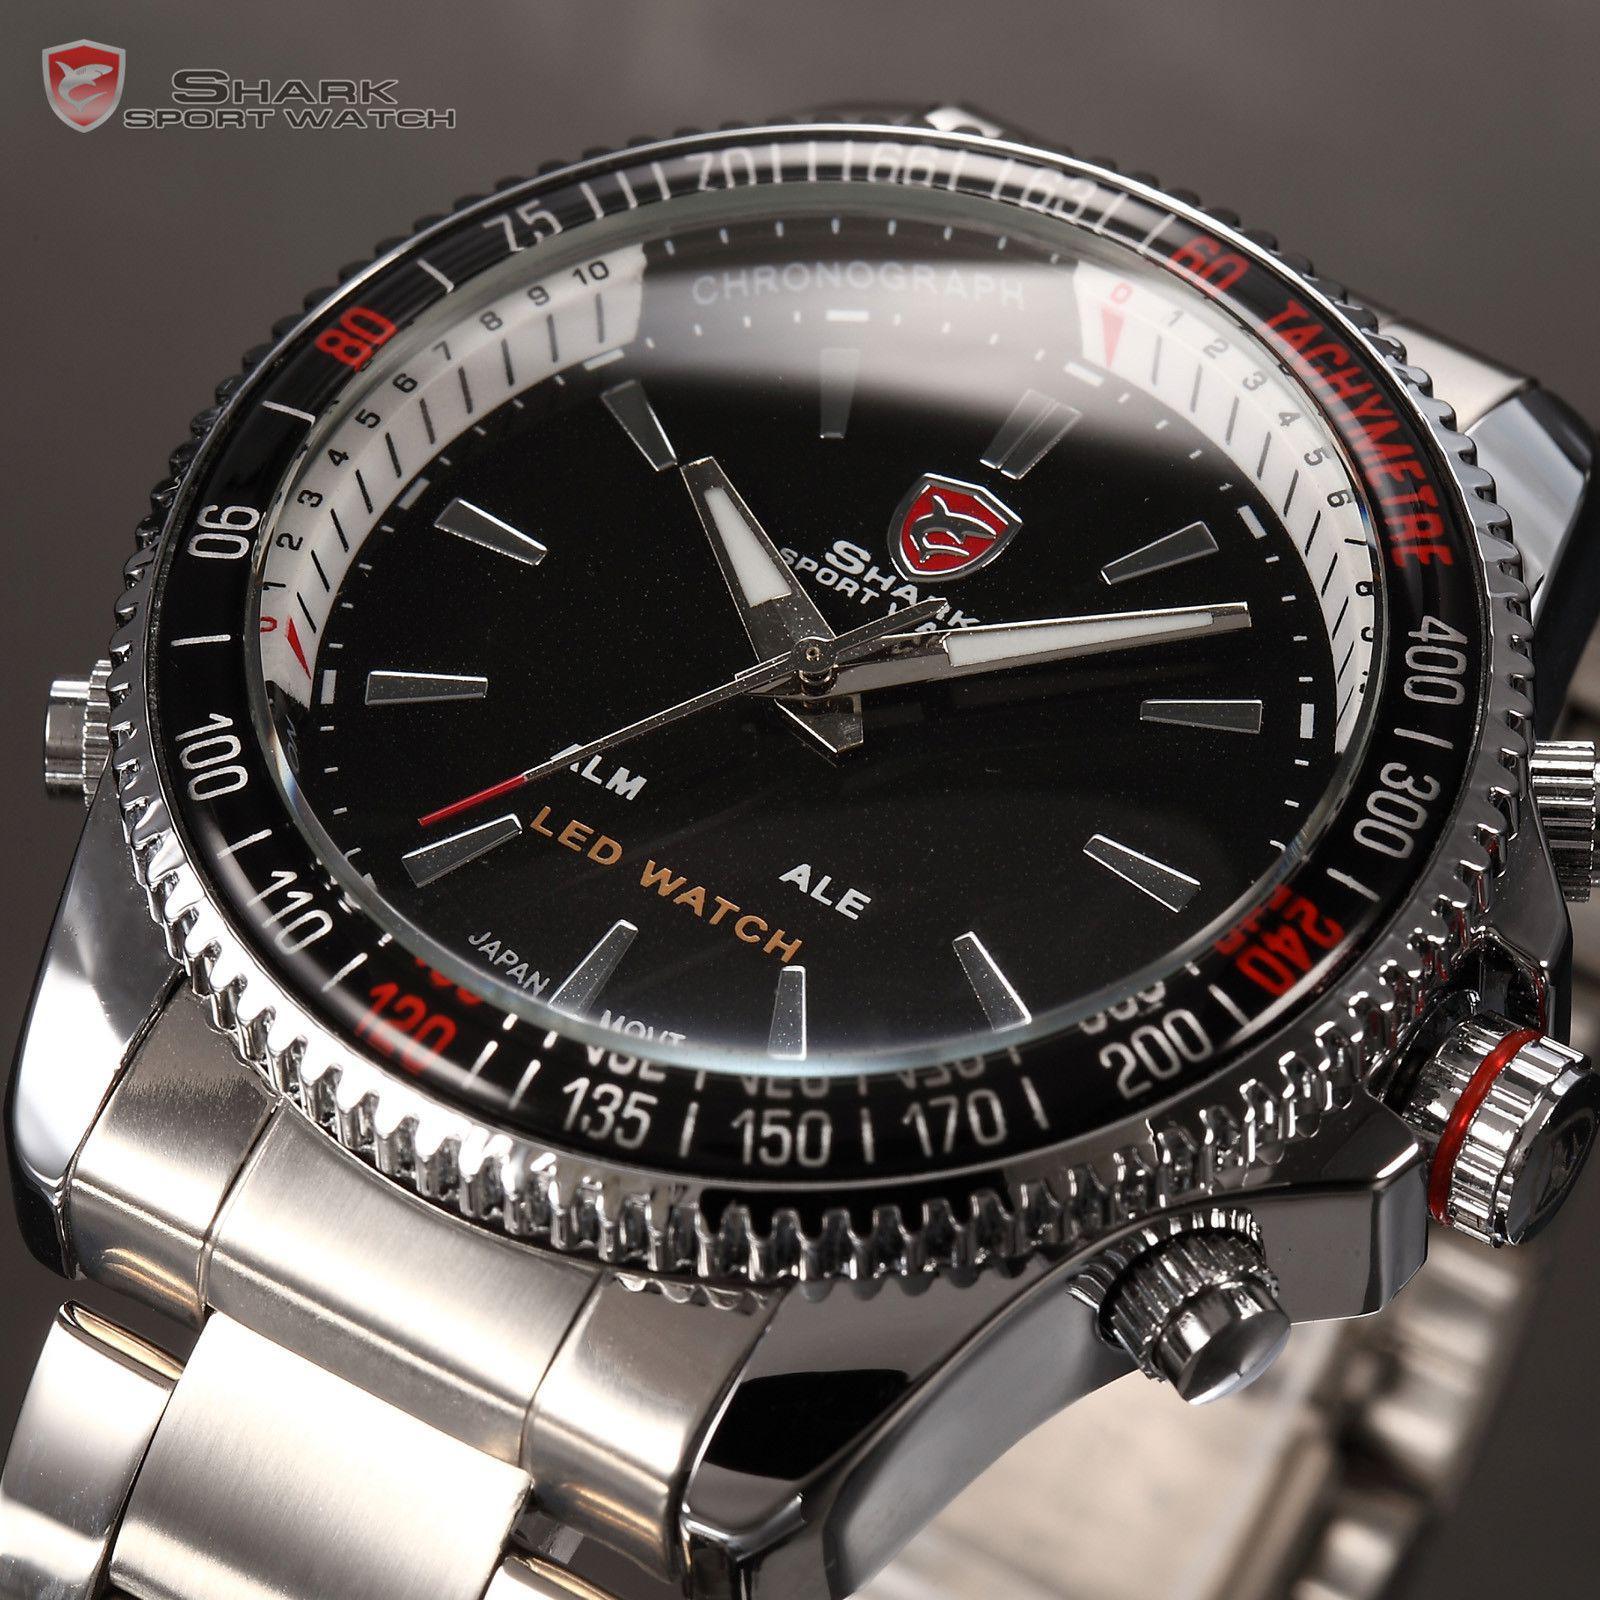 whole modern watches in men s watches buy cheap modern shark digital analogy watches led silver stainless sport quartz wrist watch men watch sh003